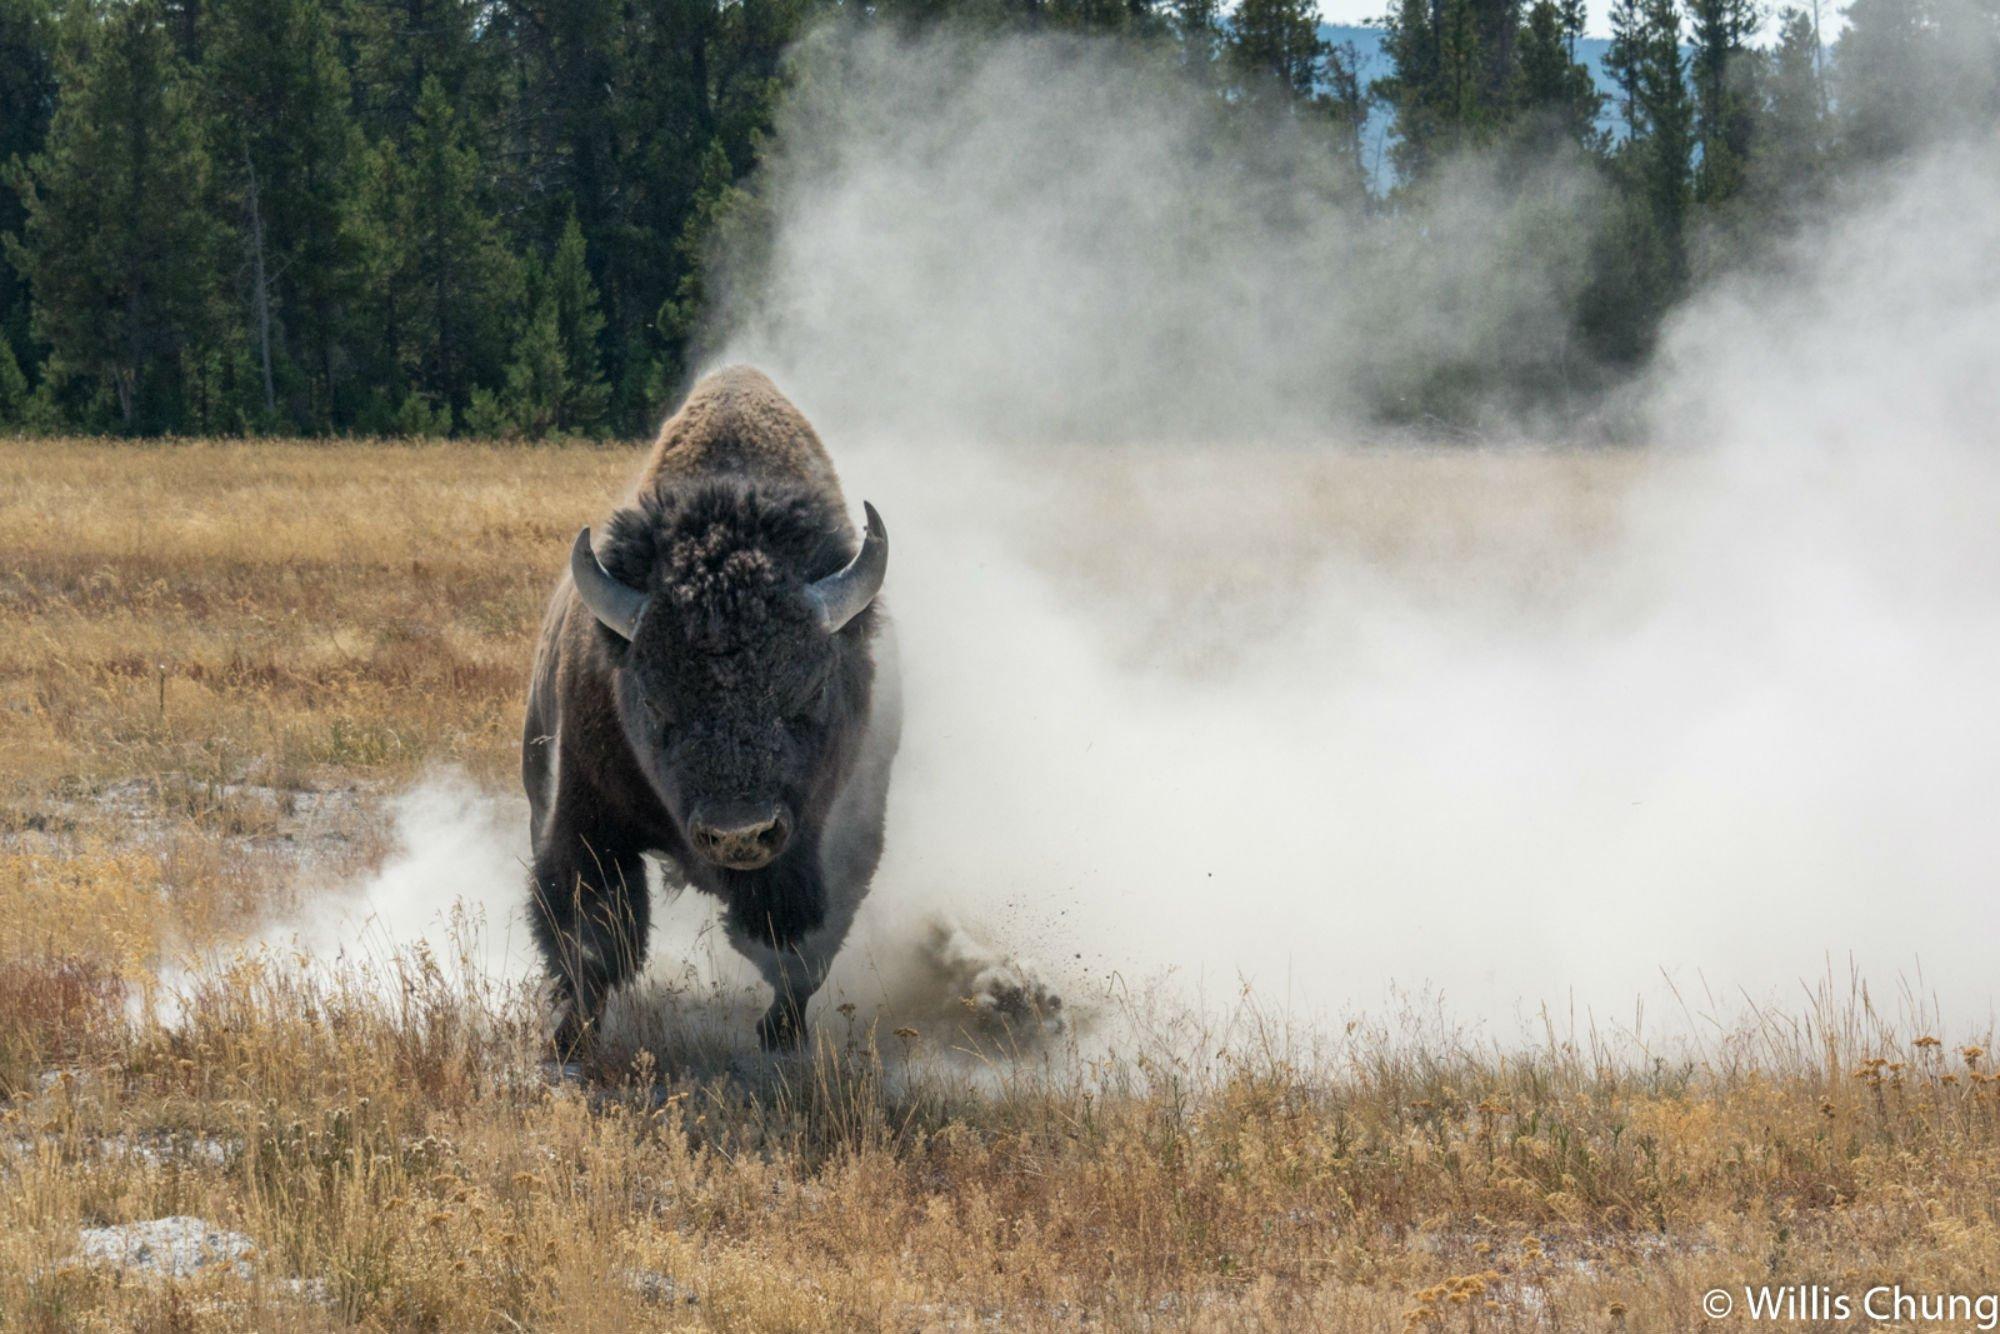 Chung Yellowstone Bull 10 image